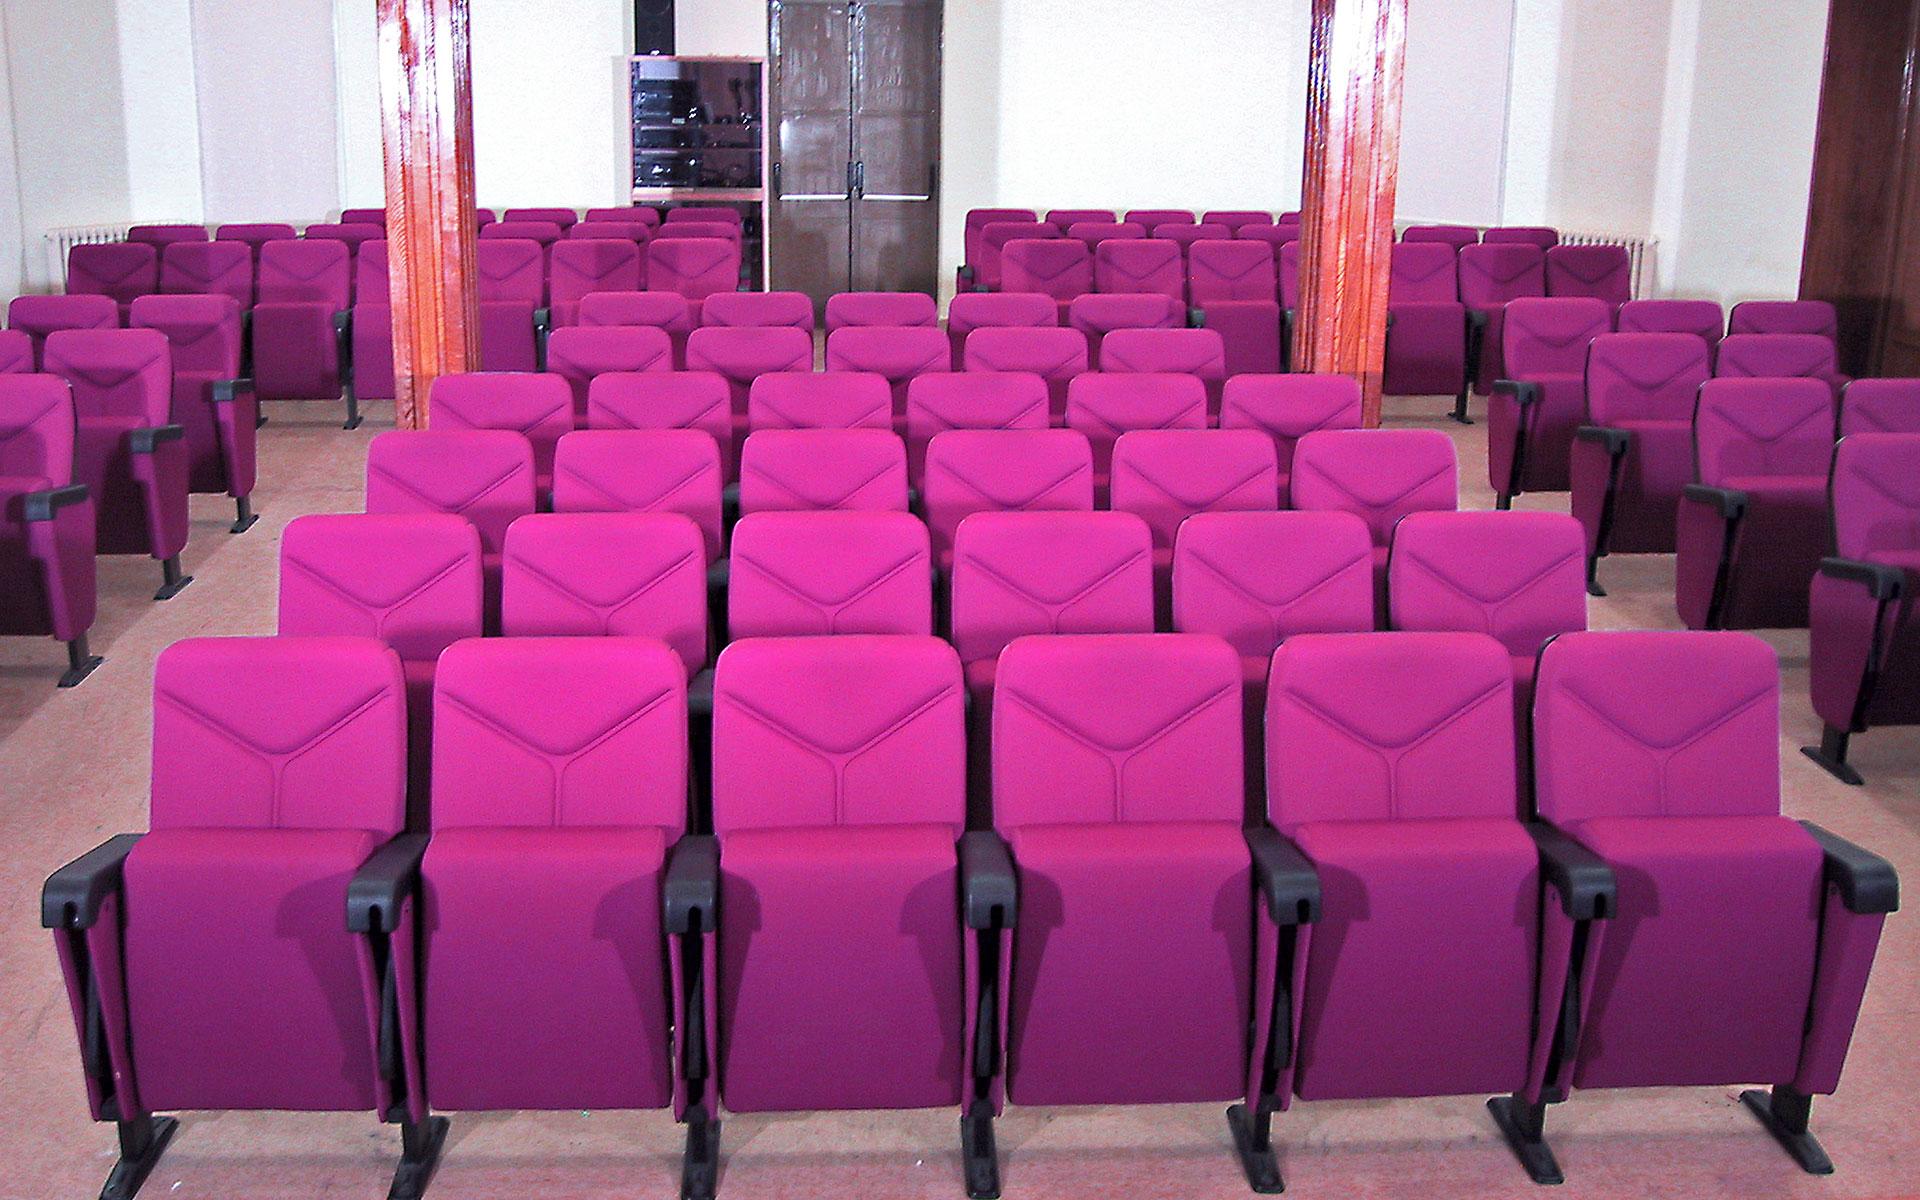 Proyectos butacas para auditorios euro seating - Universidad de diseno madrid ...